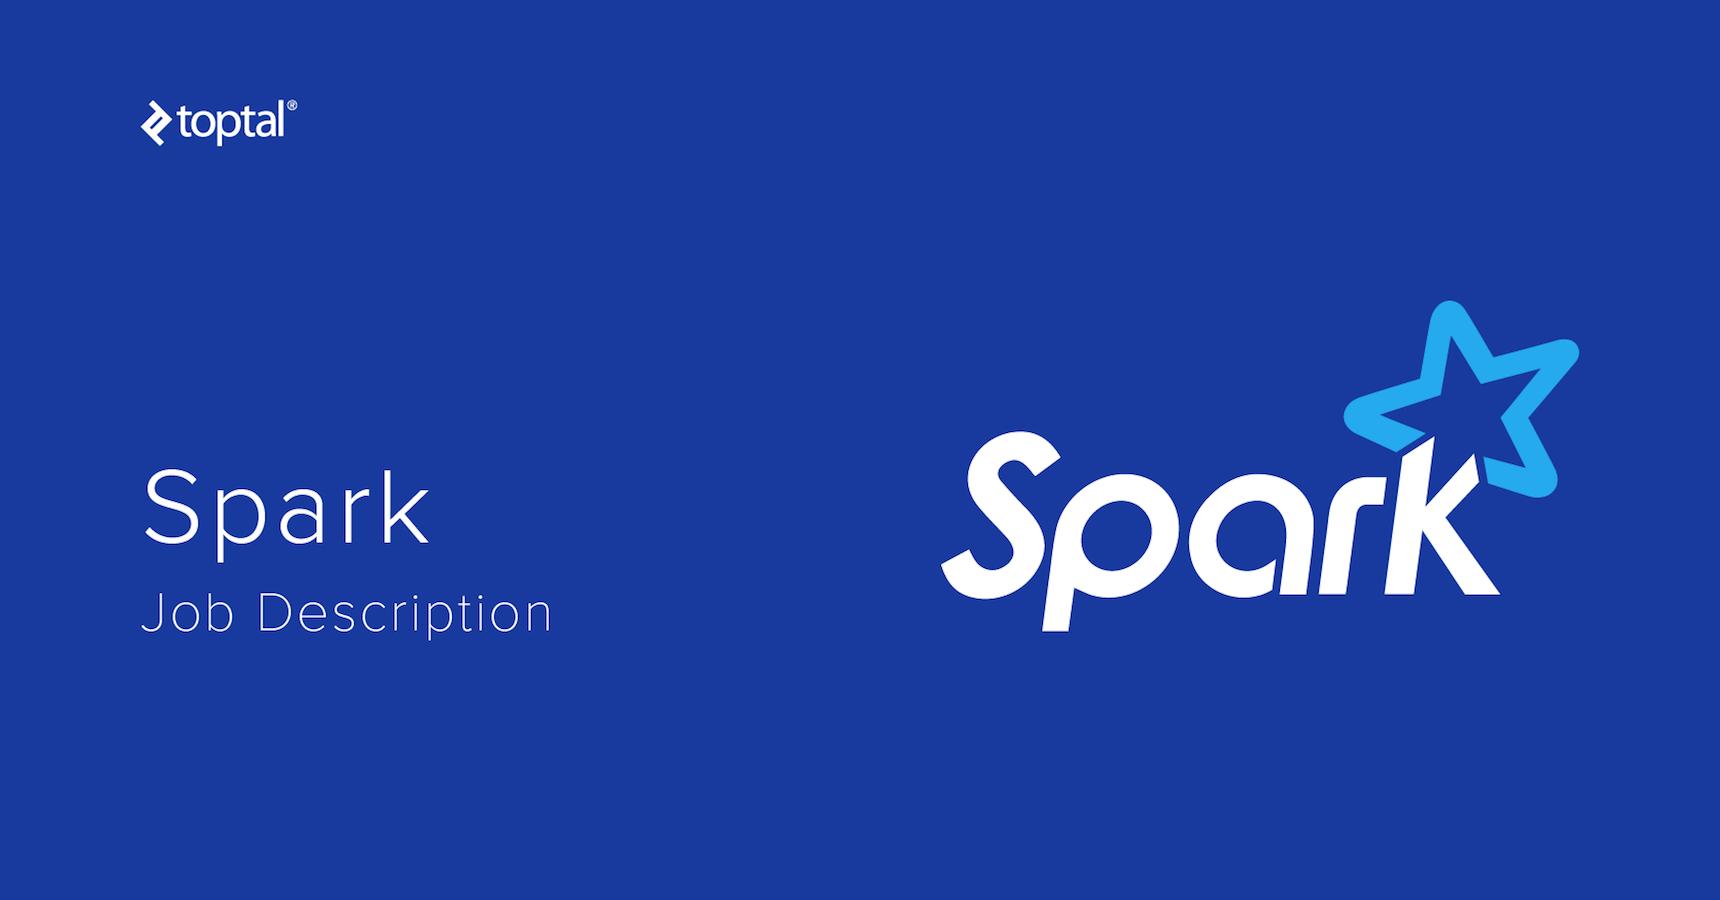 Spark Developer Job Description Template   Toptal®